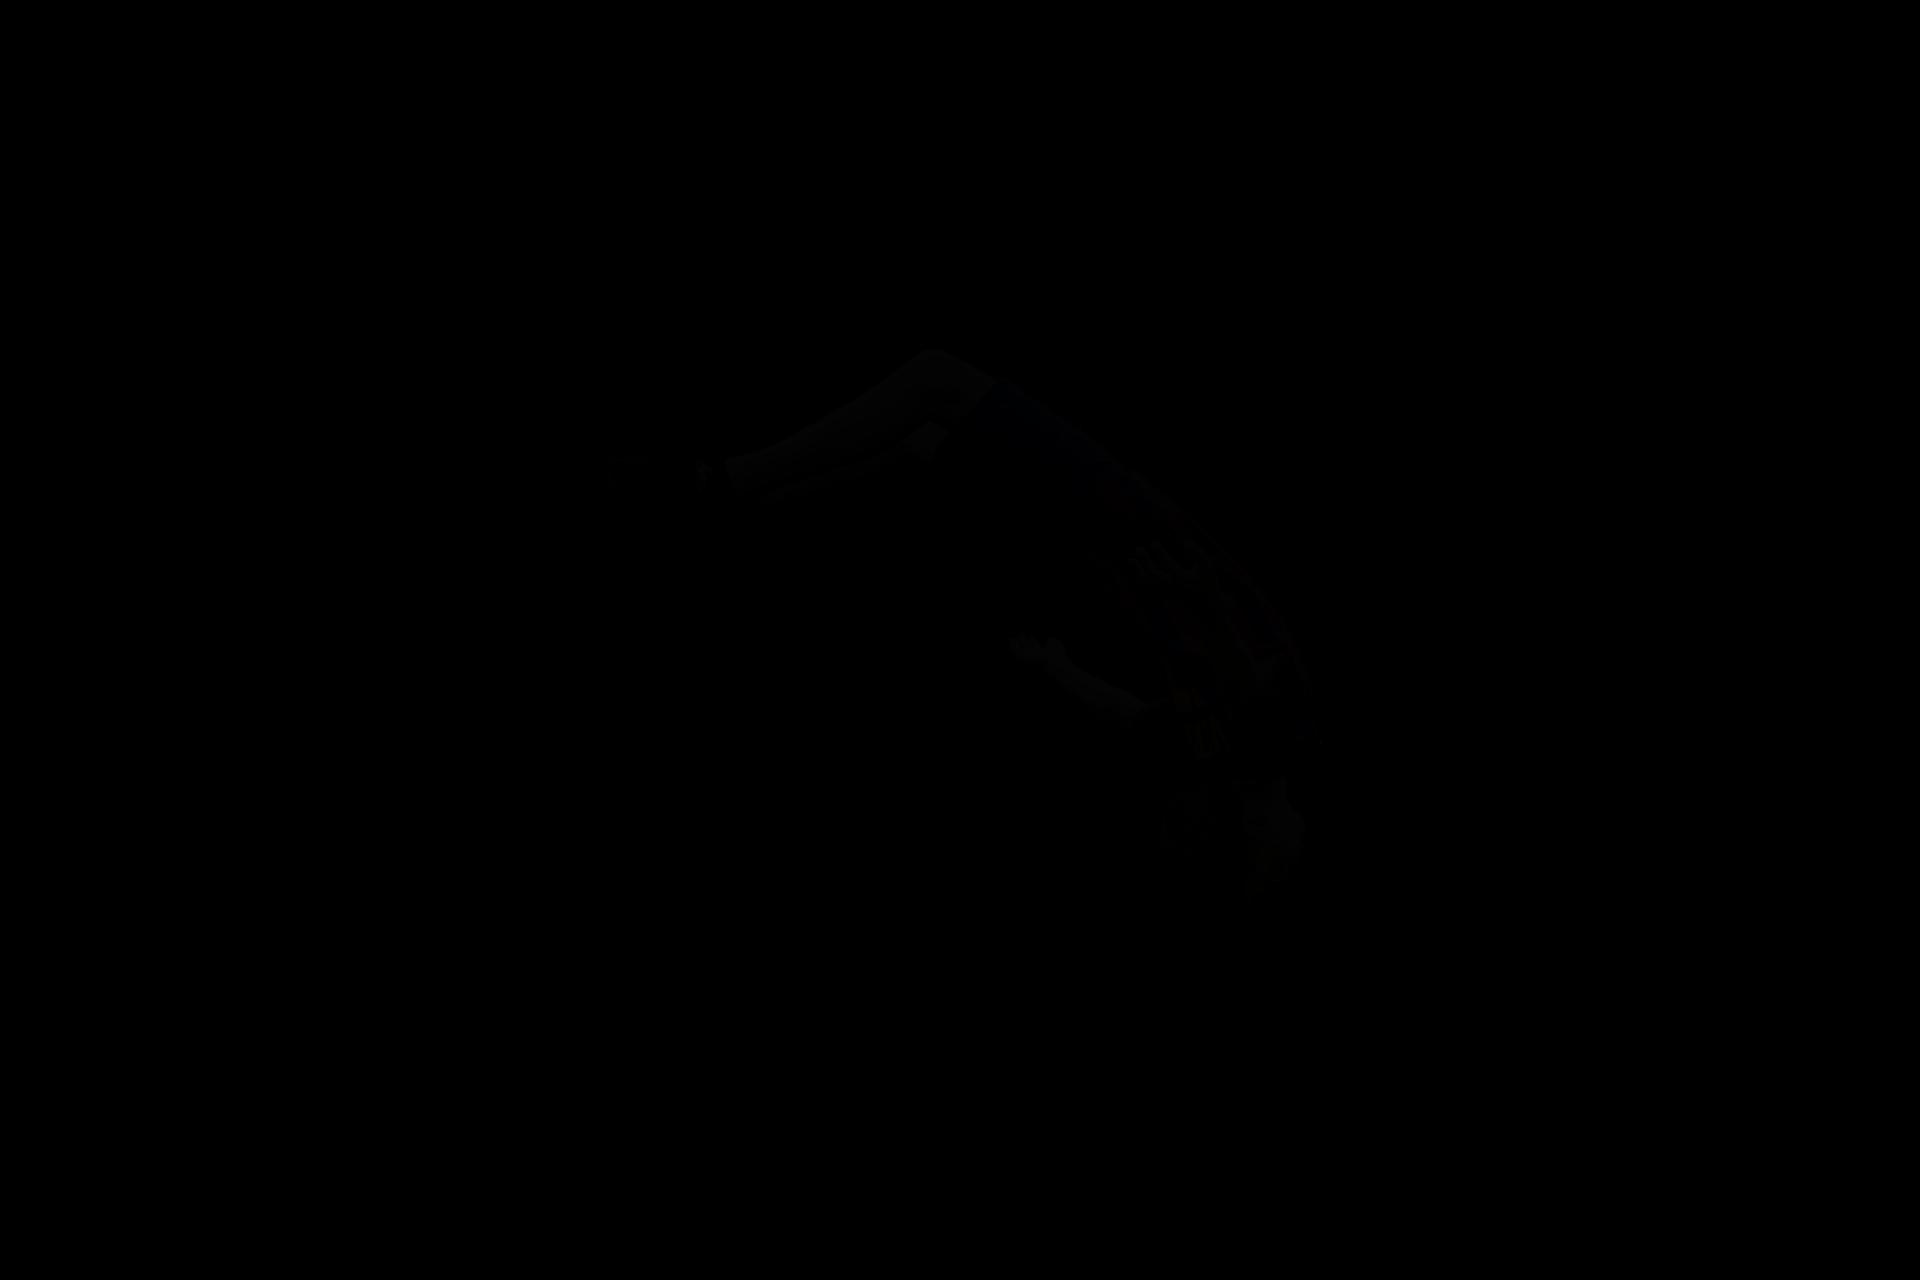 Monochrome photography Silhouette Logo.